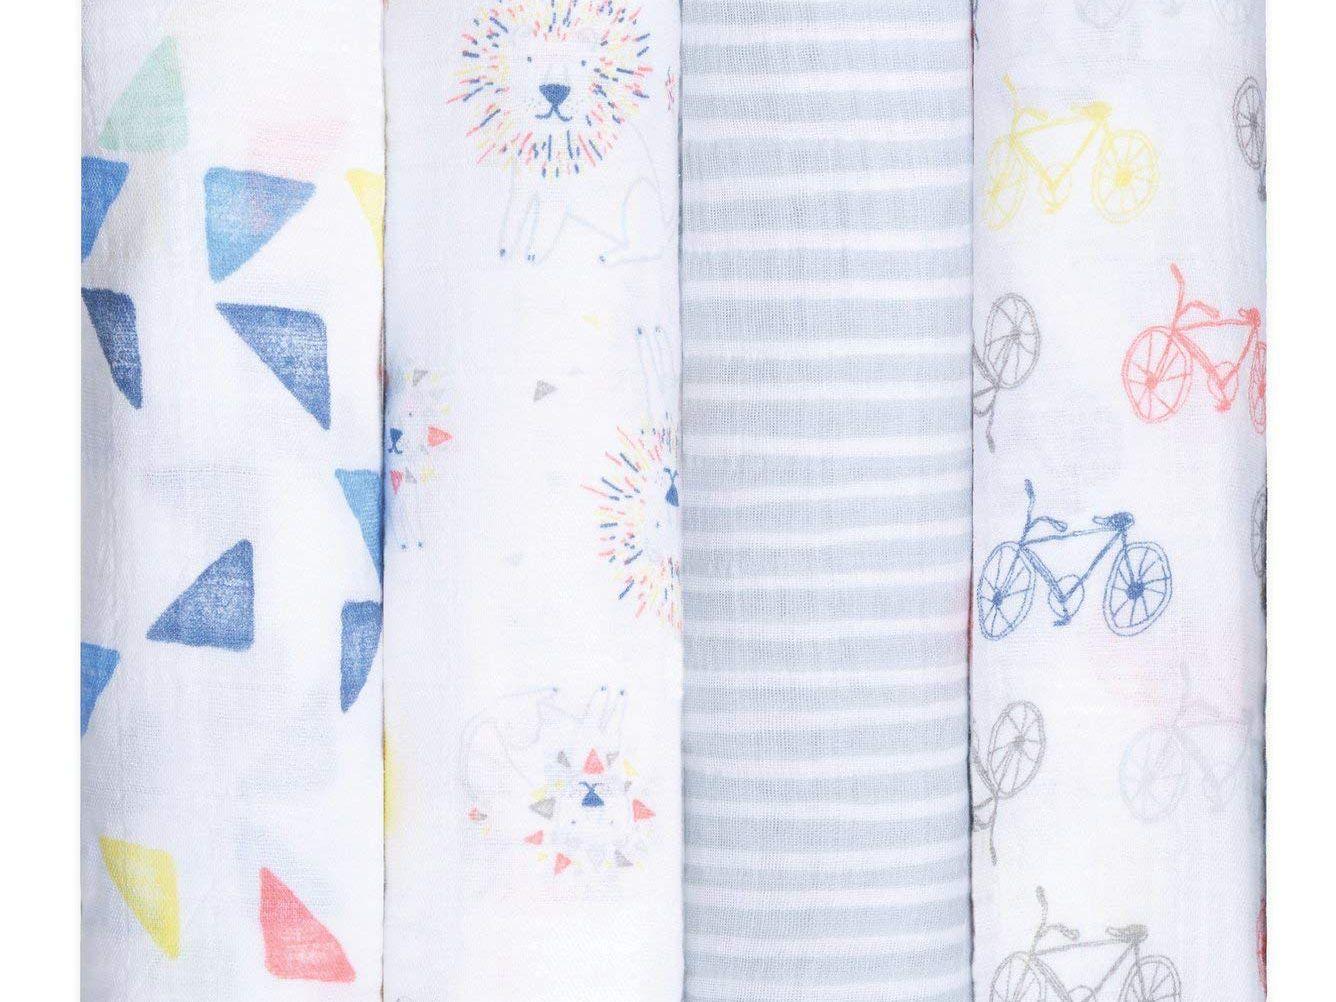 Ziyunlong Baby Blankets Knitted Soft Newborn Blanket for Pram//Travel//Moses Basket Beige Size 80 x 100cm